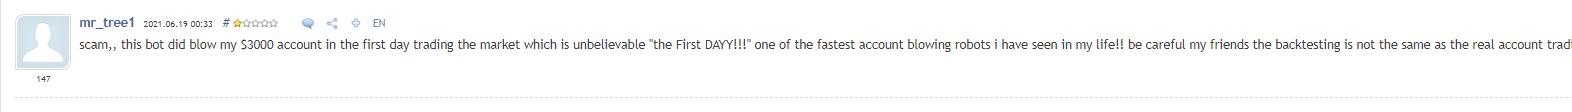 Customer review on MQL 5 community